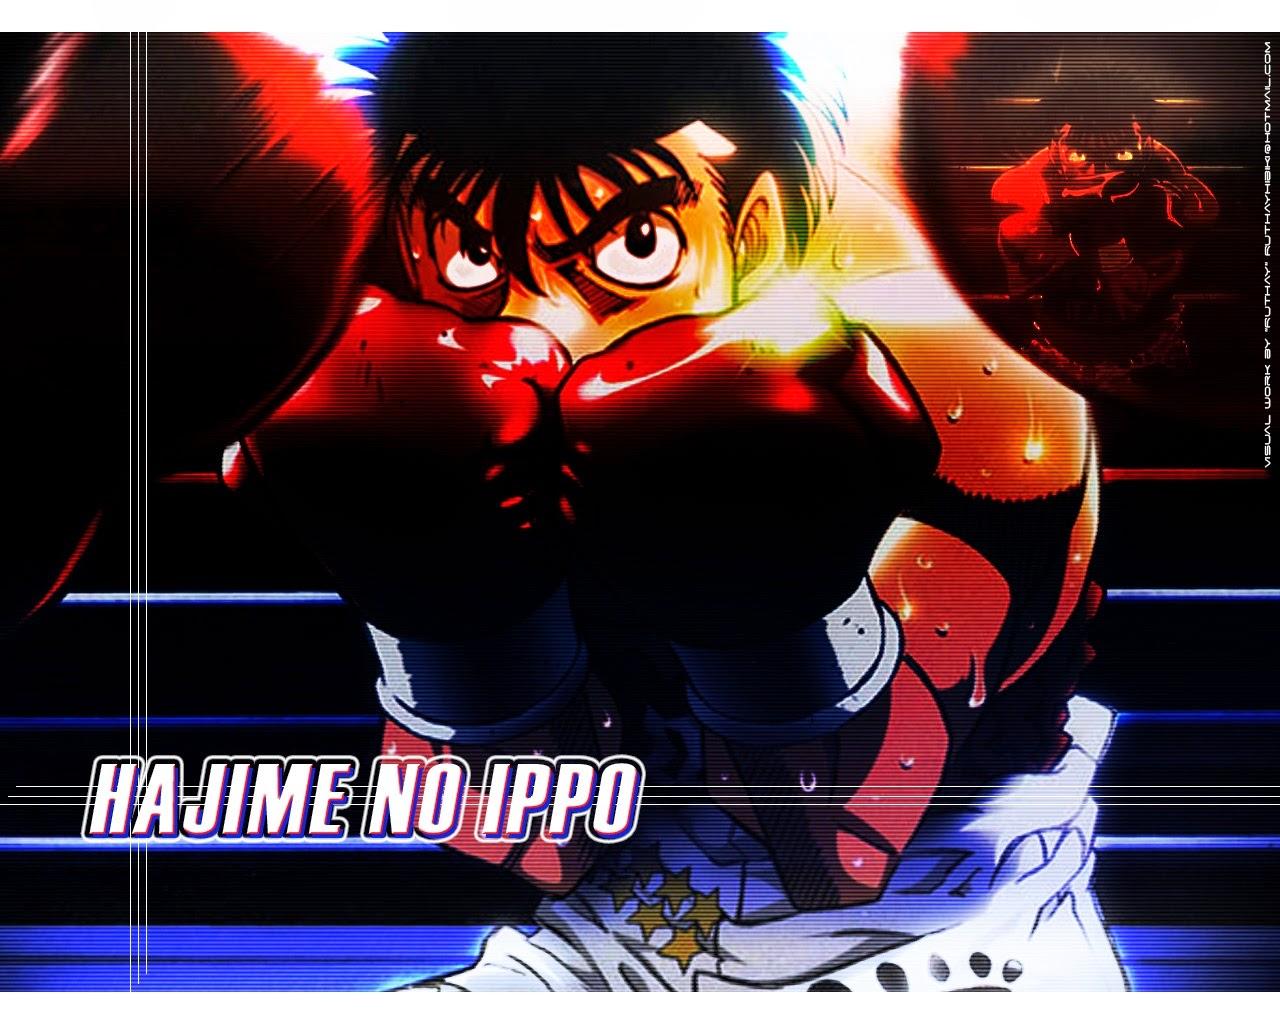 Hajime no ippo torrent